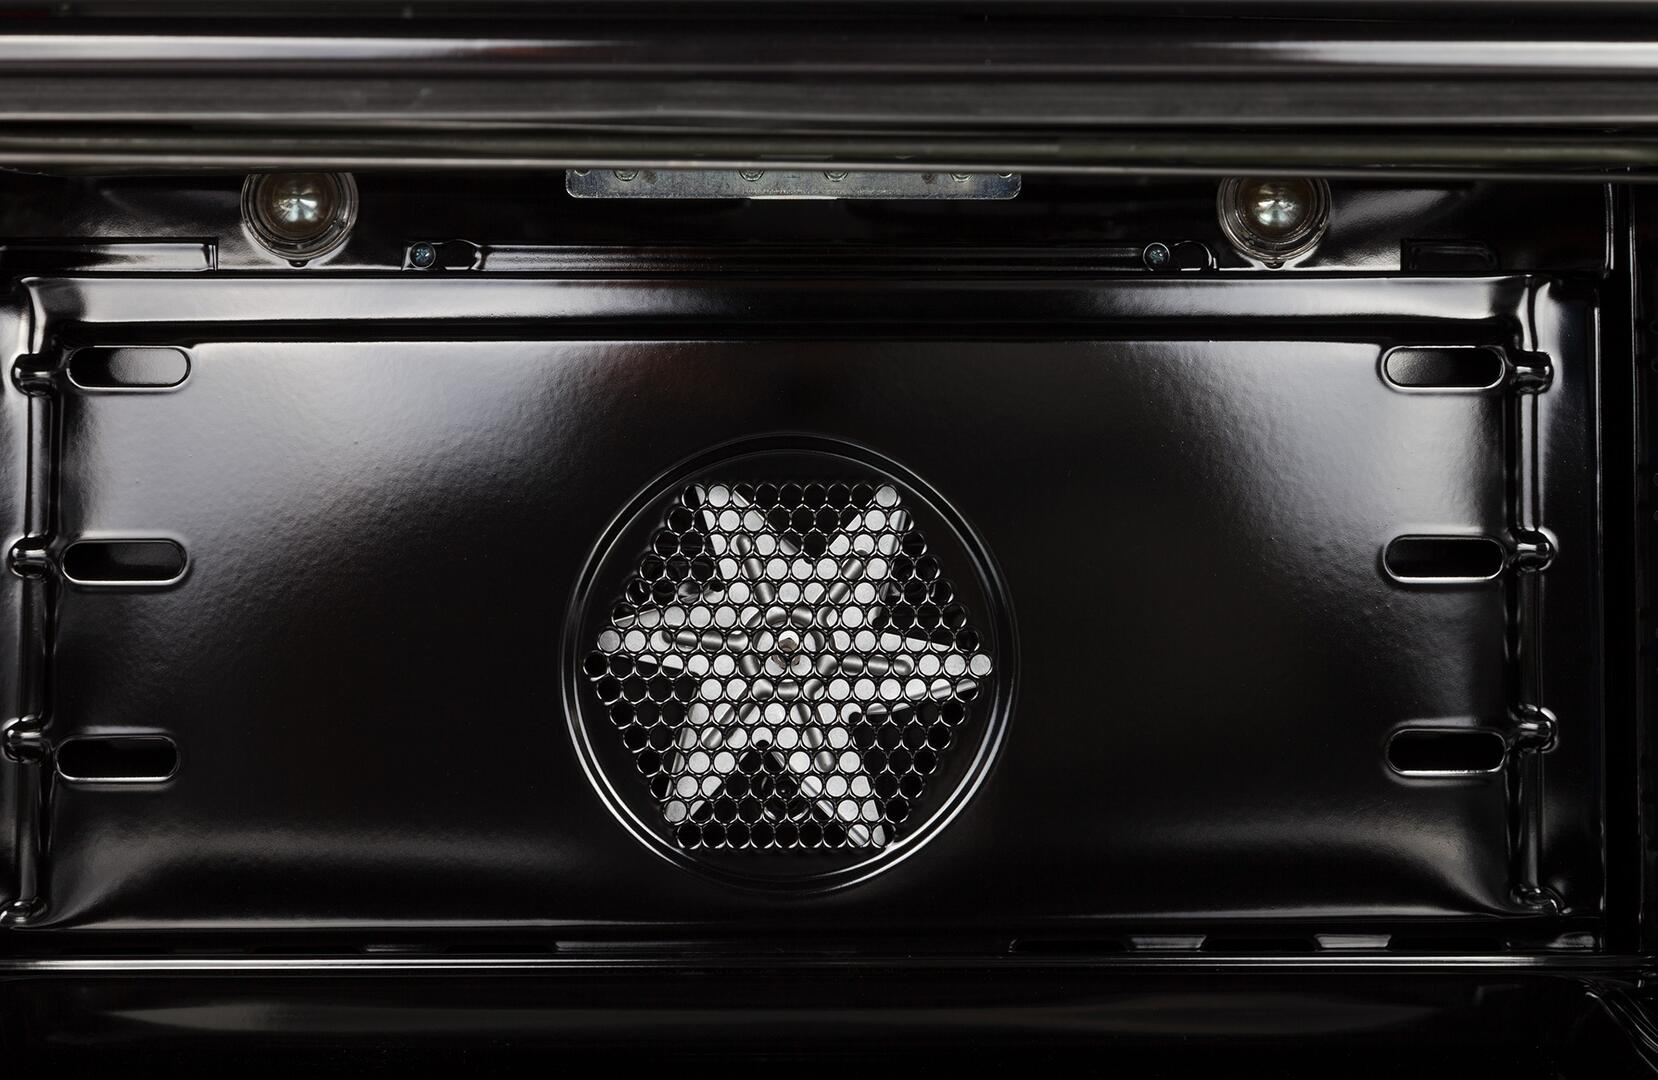 Ilve Nostalgie UPDN100FDMPNLP Freestanding Dual Fuel Range Black, 27